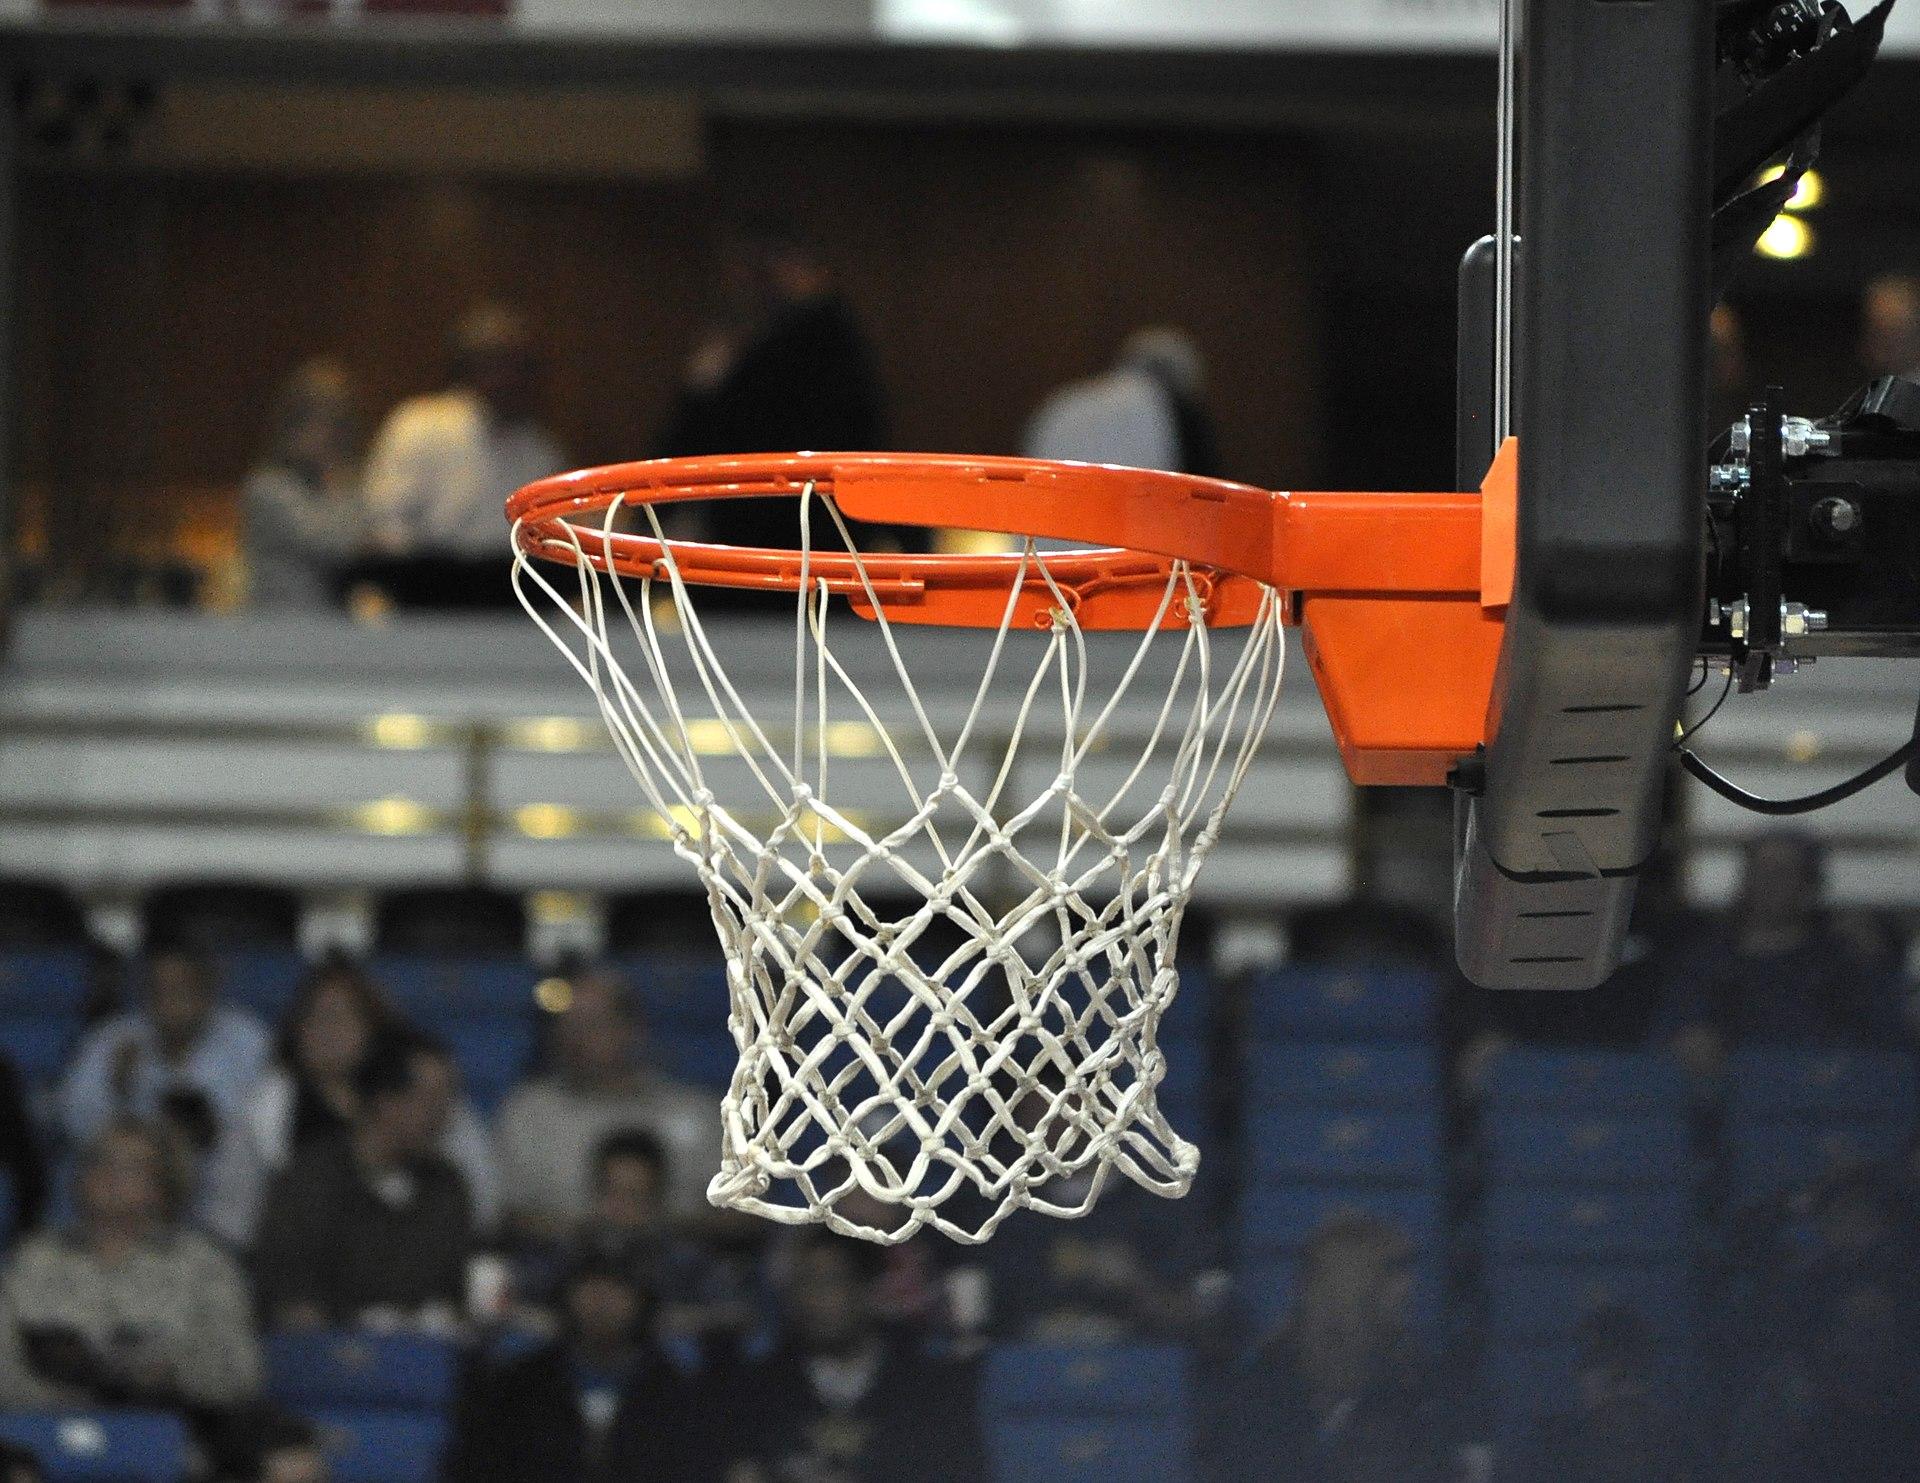 Backboard (basketball) - Wikipedia